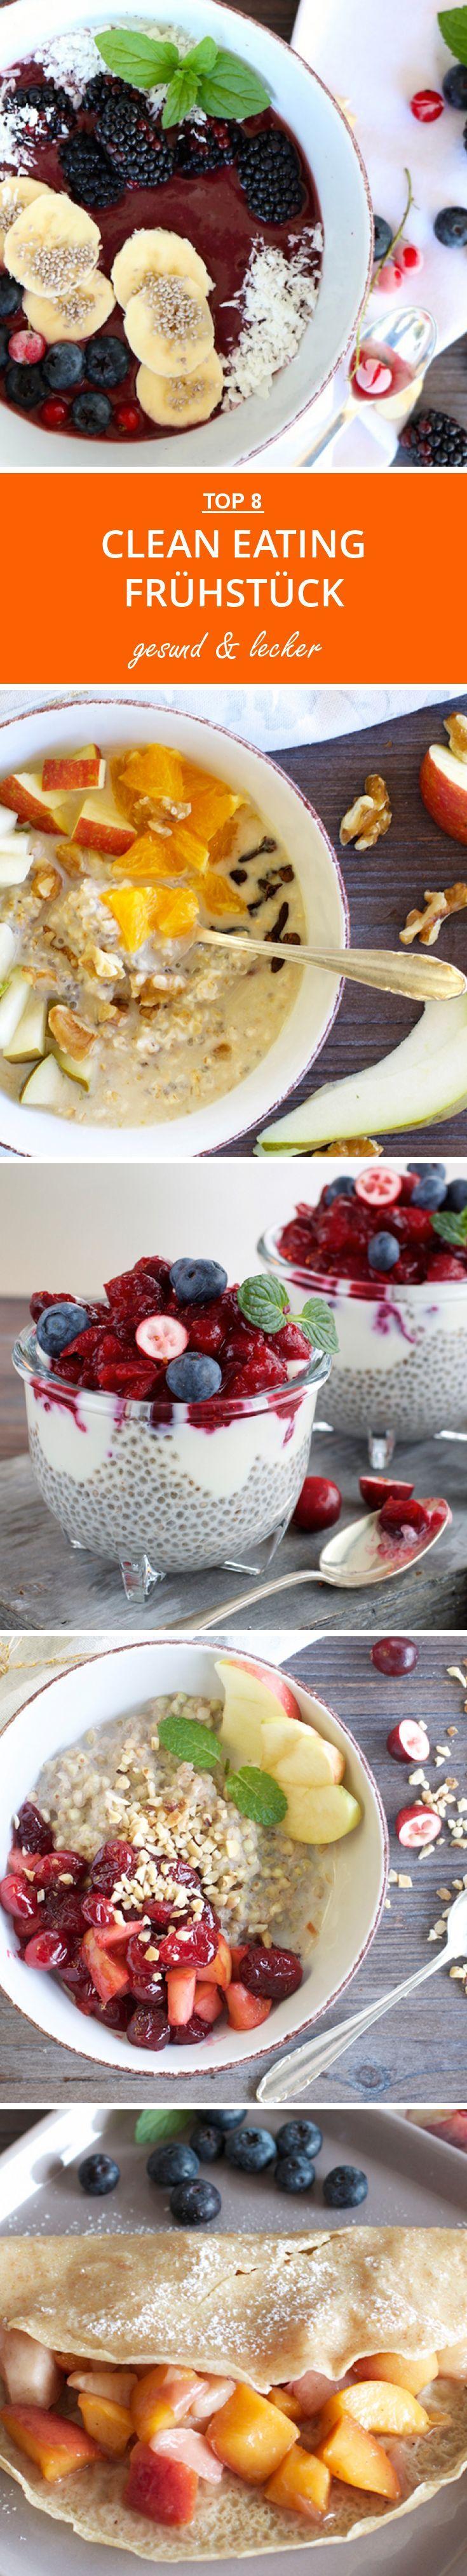 Sauberes Essen Frühstück | eatsmarter.de   – Frühstück